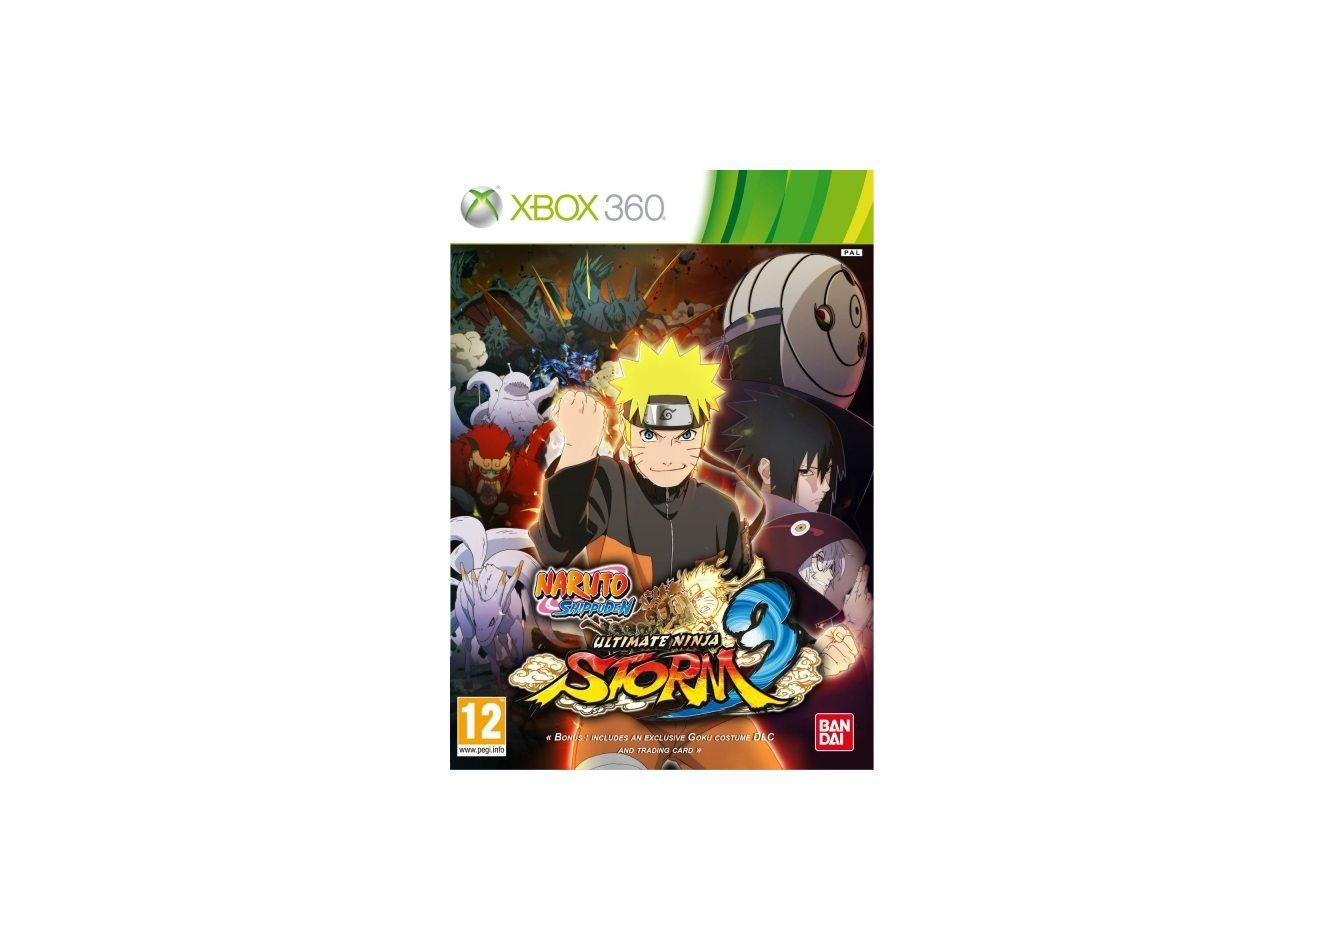 Xbox 360 Naruto Shippuden: Ultimate Ninja Storm 3 Day 1 Edition Xbox 360